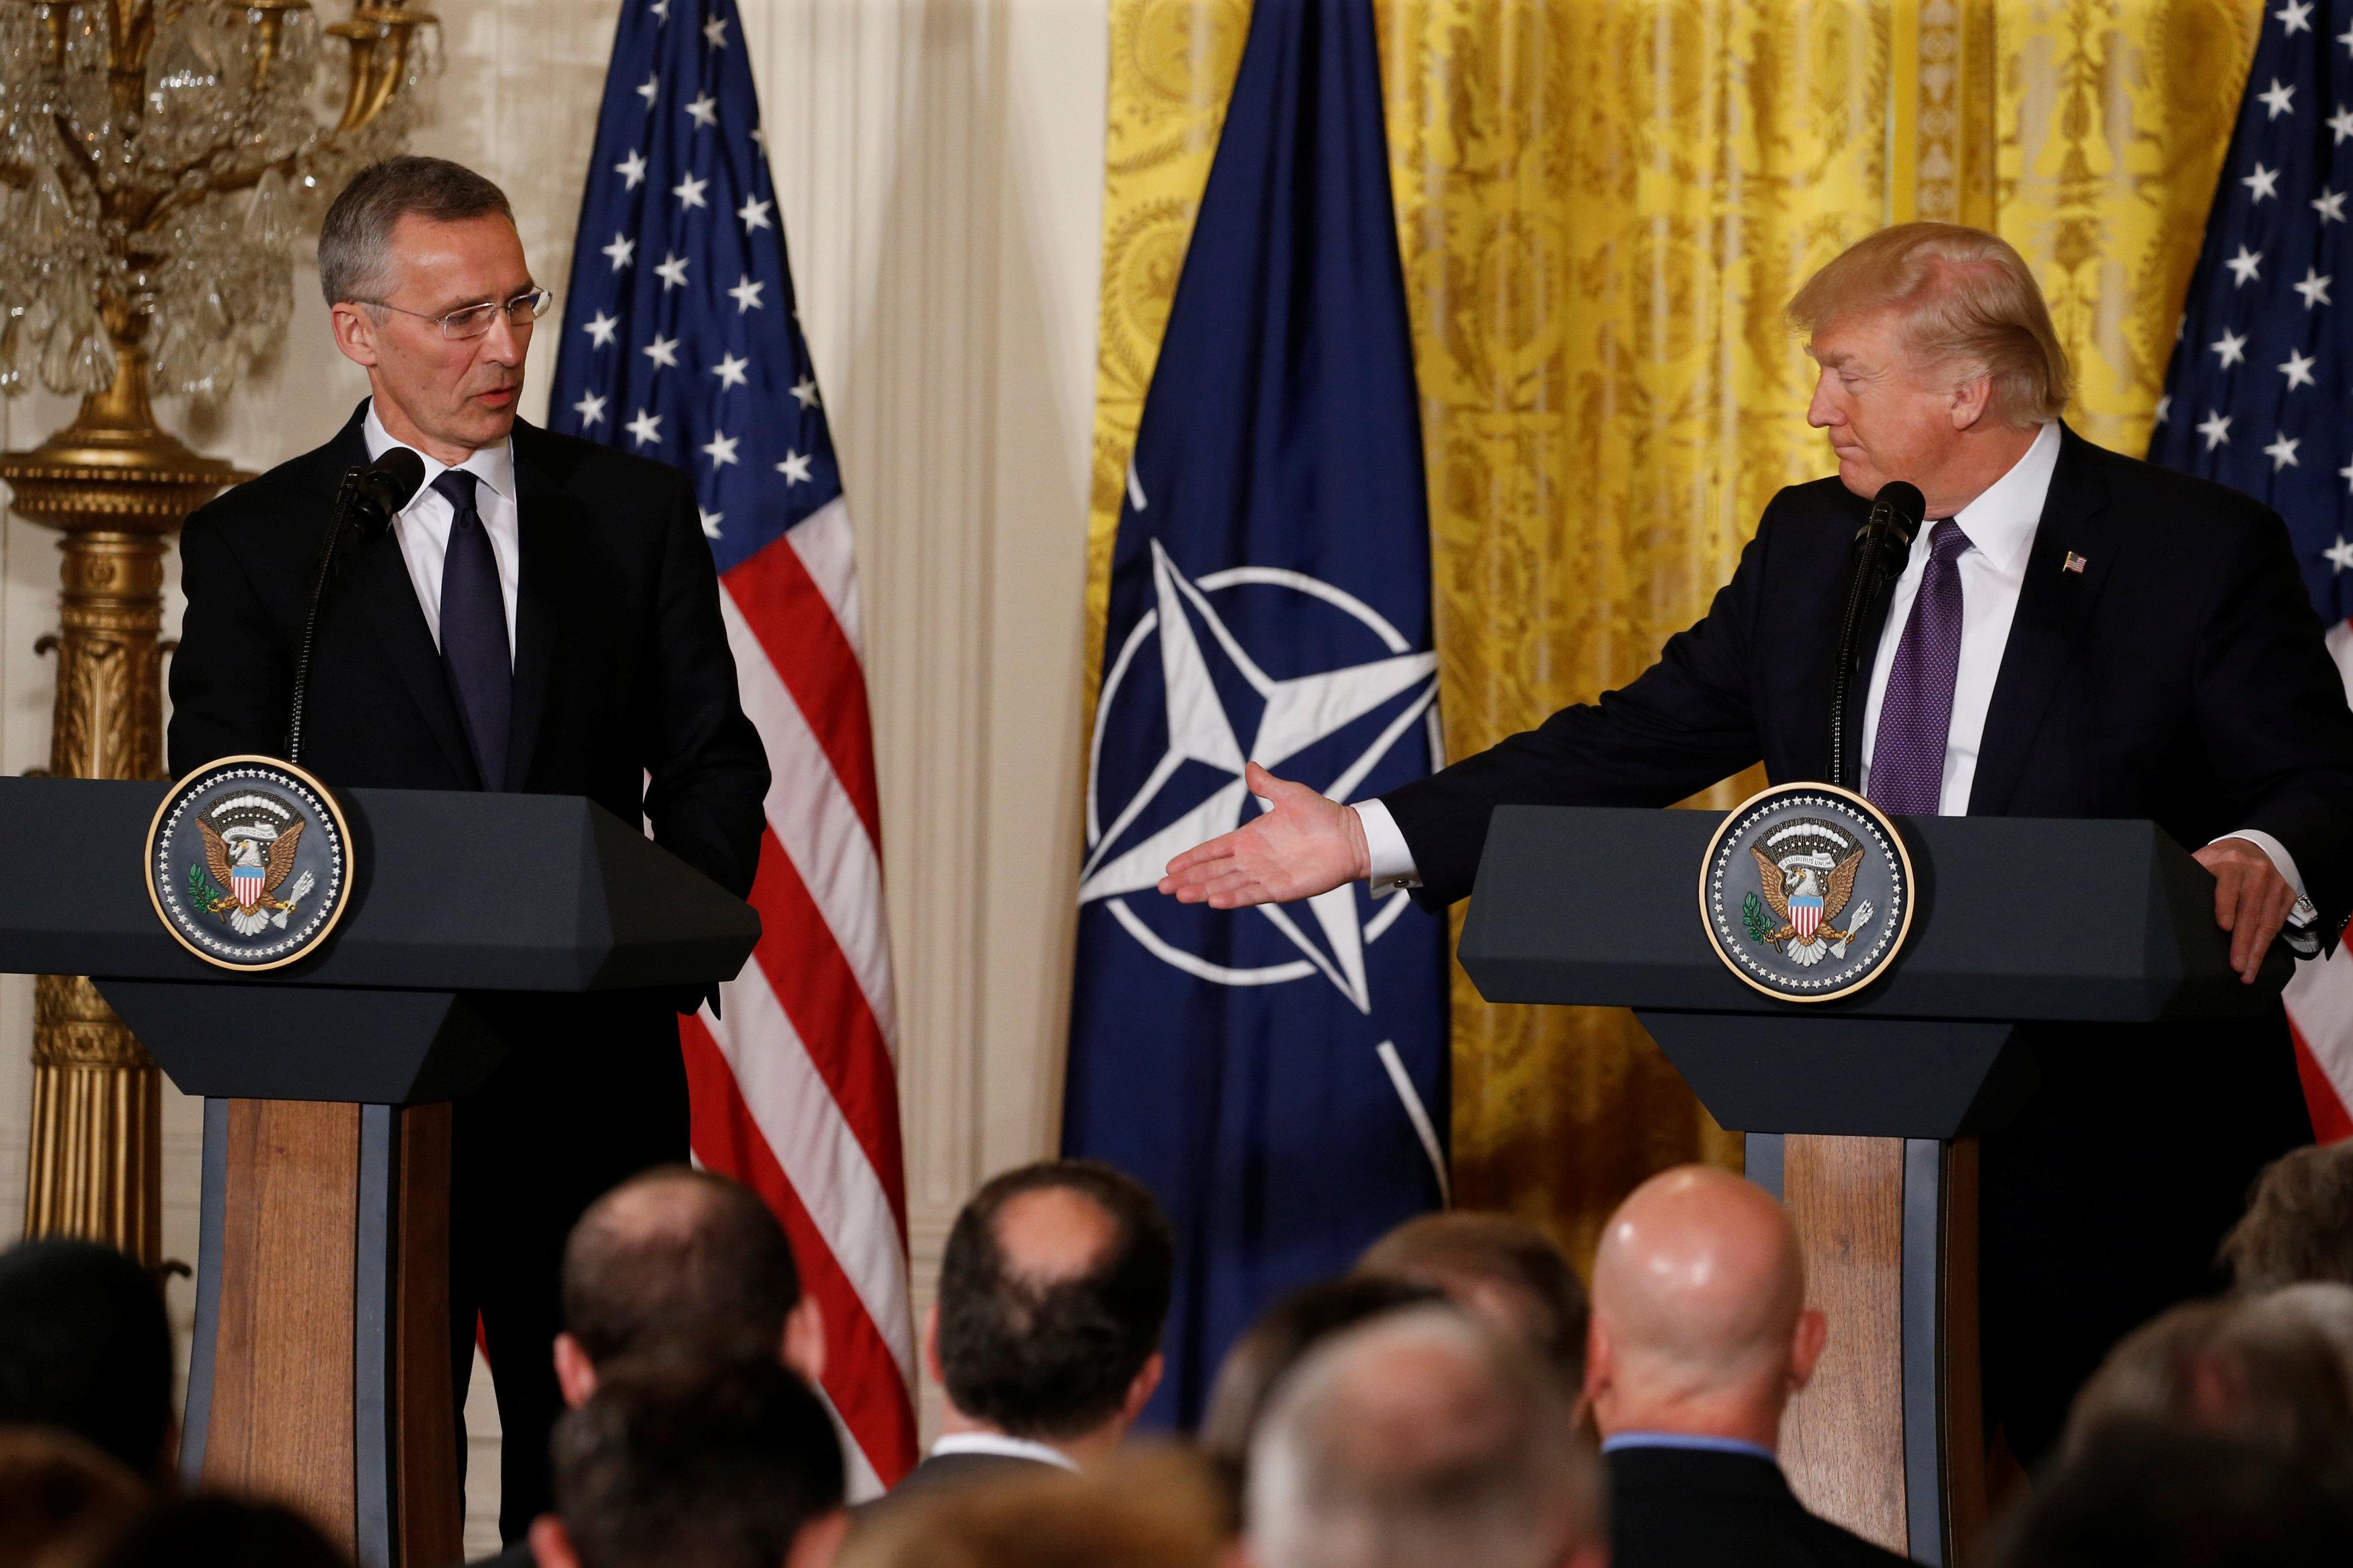 2017 04 12T211353Z 181692619 RC19C79AEC00 RTRMADP 3 USA NATO